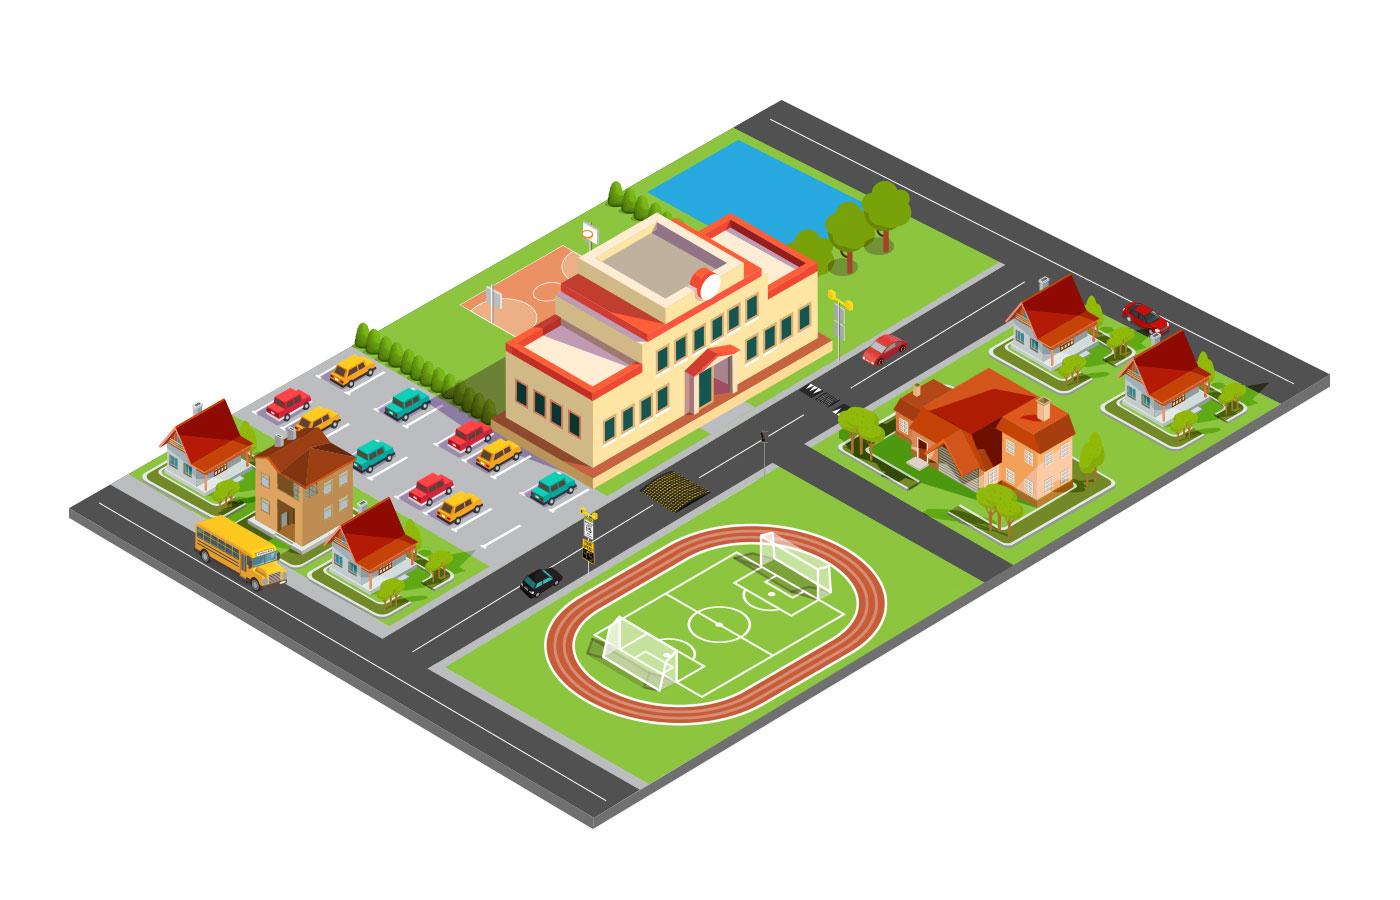 School Zone Interactive Map